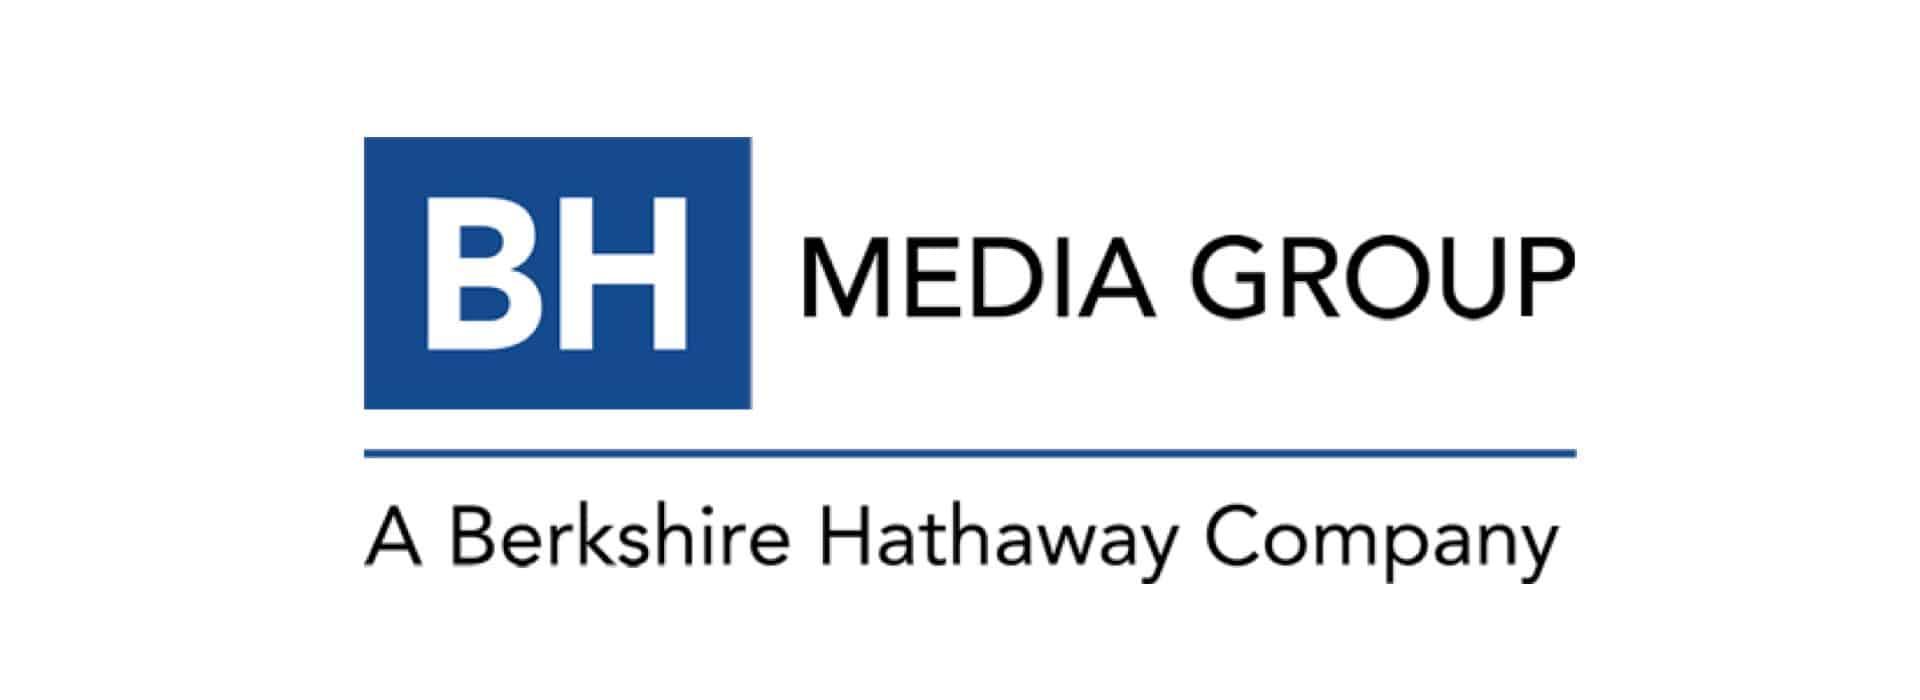 BH Media Group logo